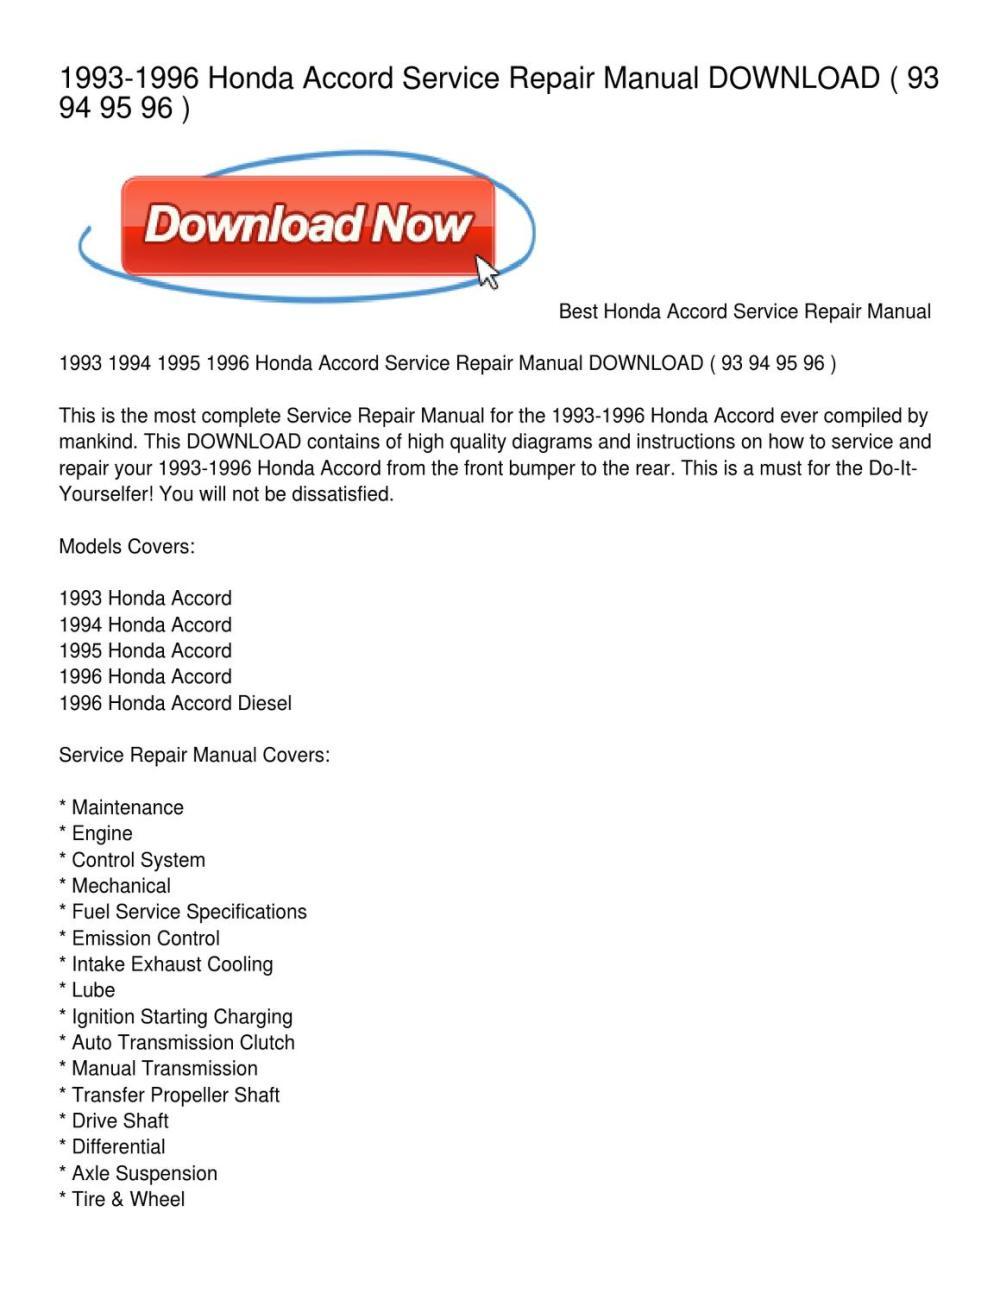 medium resolution of 1993 1996 honda accord service repair manual download by whitney roberts issuu